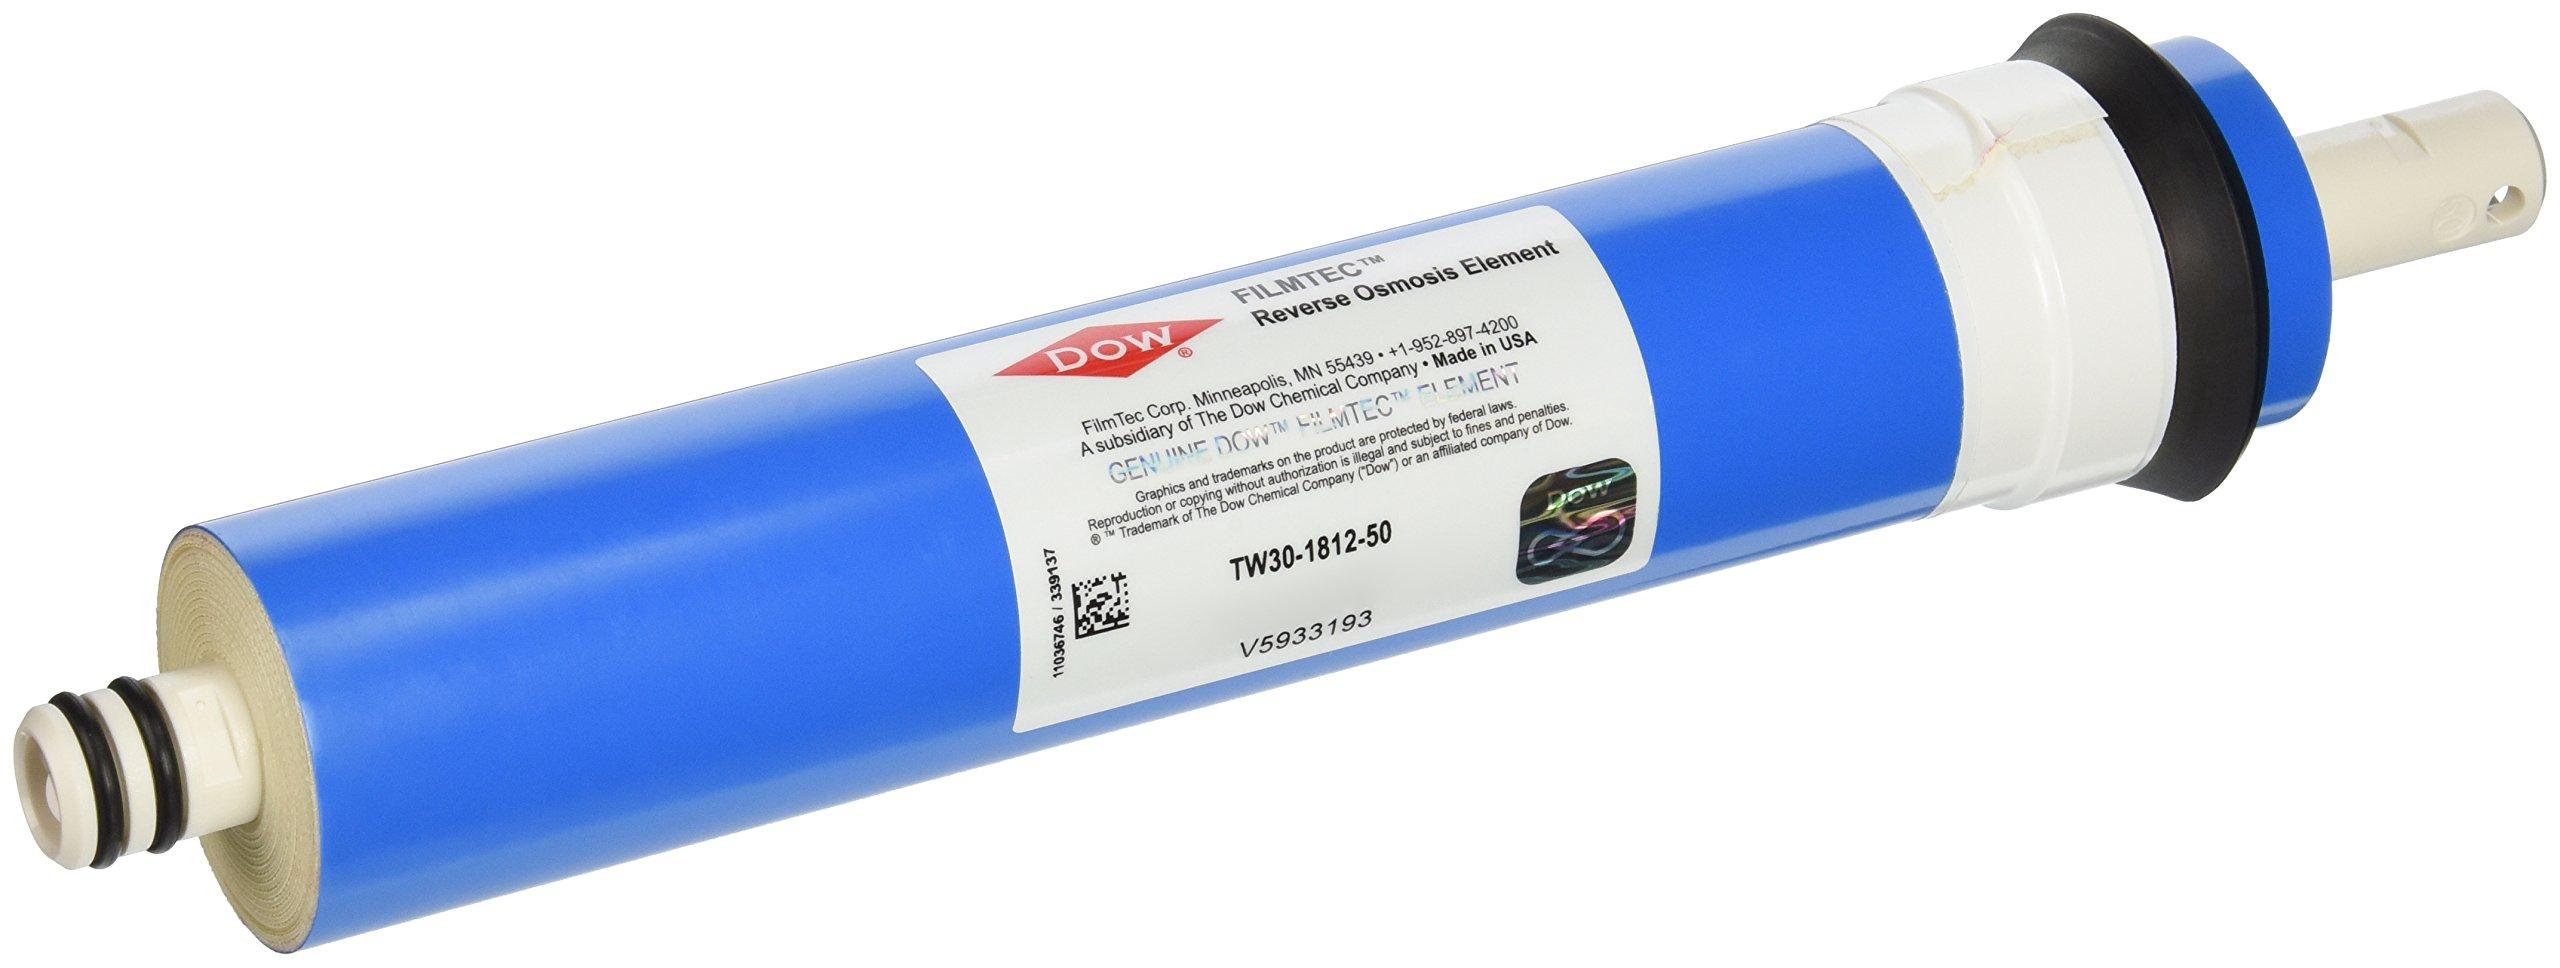 Filmtec TW30-1812-50 TFC Membrane, 1-Pack by Film Tec